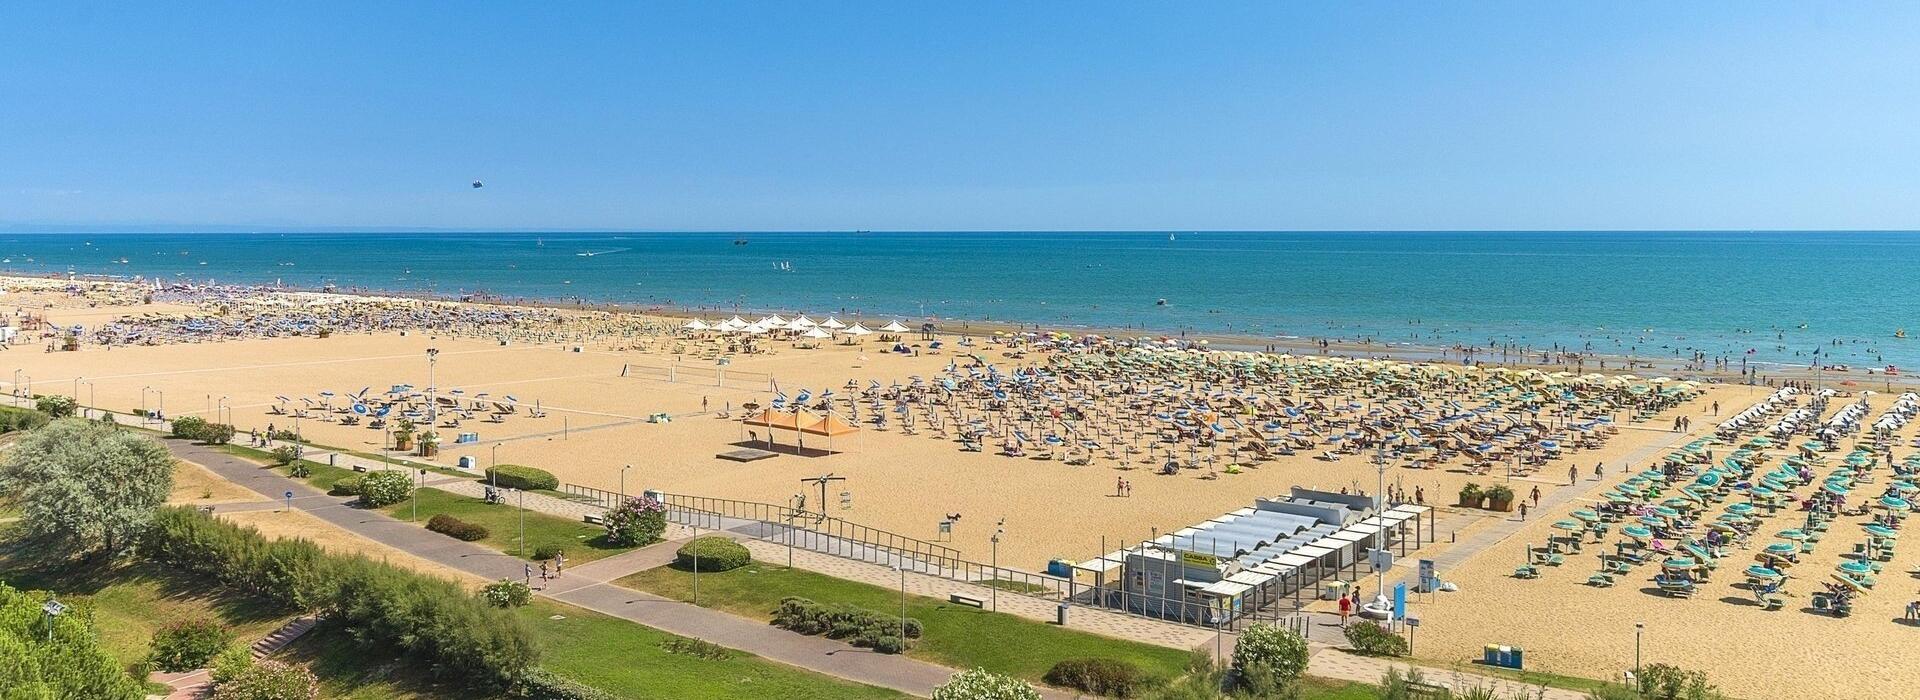 hotelvictoria en beach 015